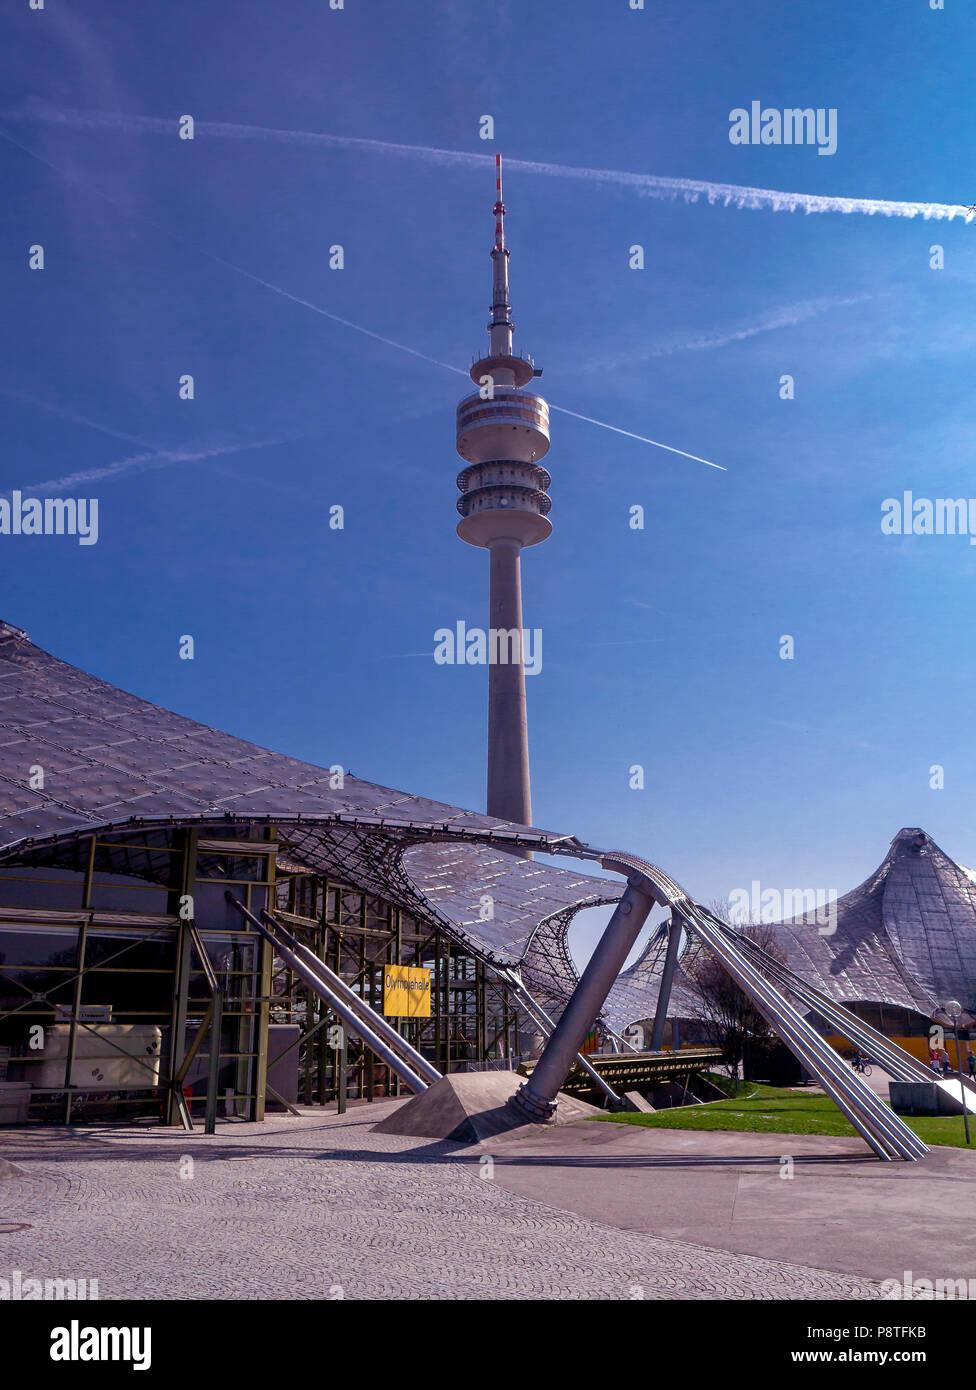 DE - Bavaria : Olympic park Munich - Stock Image